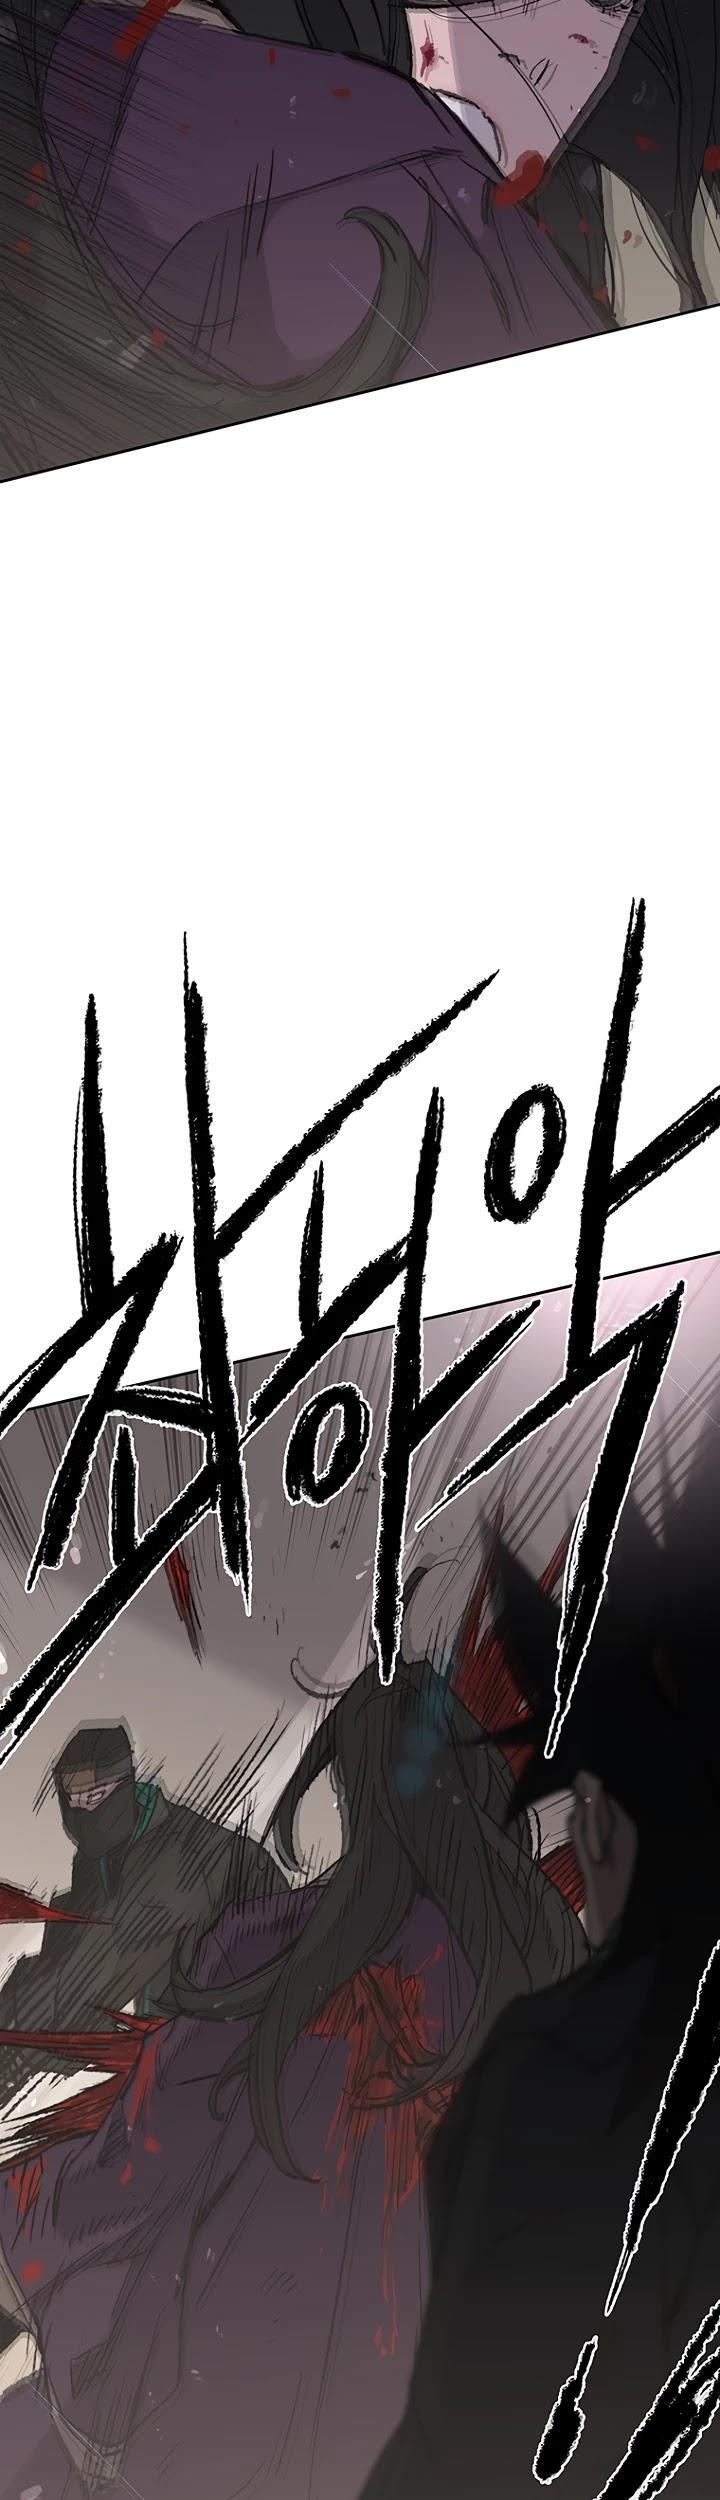 The Undefeatable Swordsman Chapter 73 page 34 - Mangakakalots.com